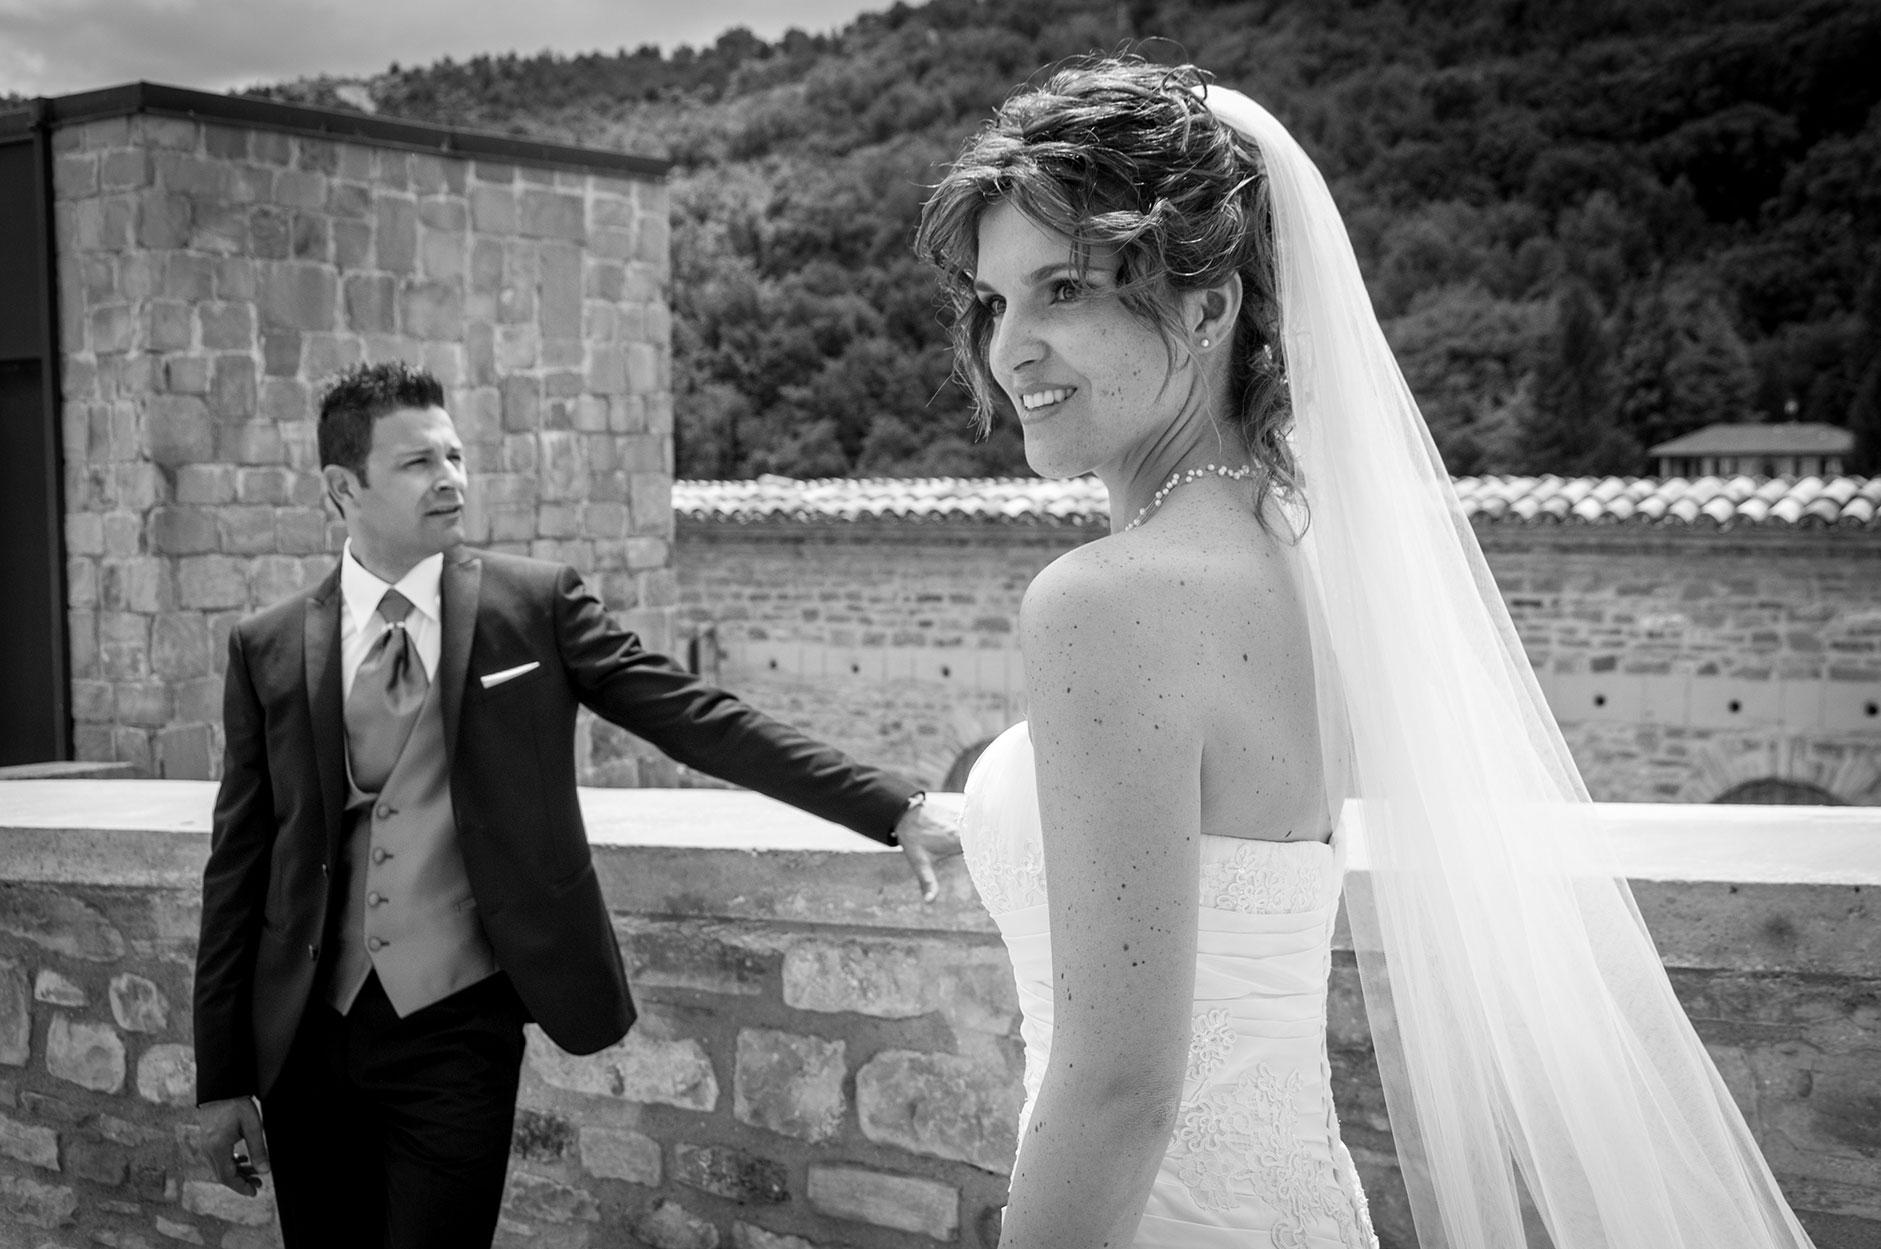 Francesca-Ferrati-wedding-photographer-Verona-Federica-Giovanni26